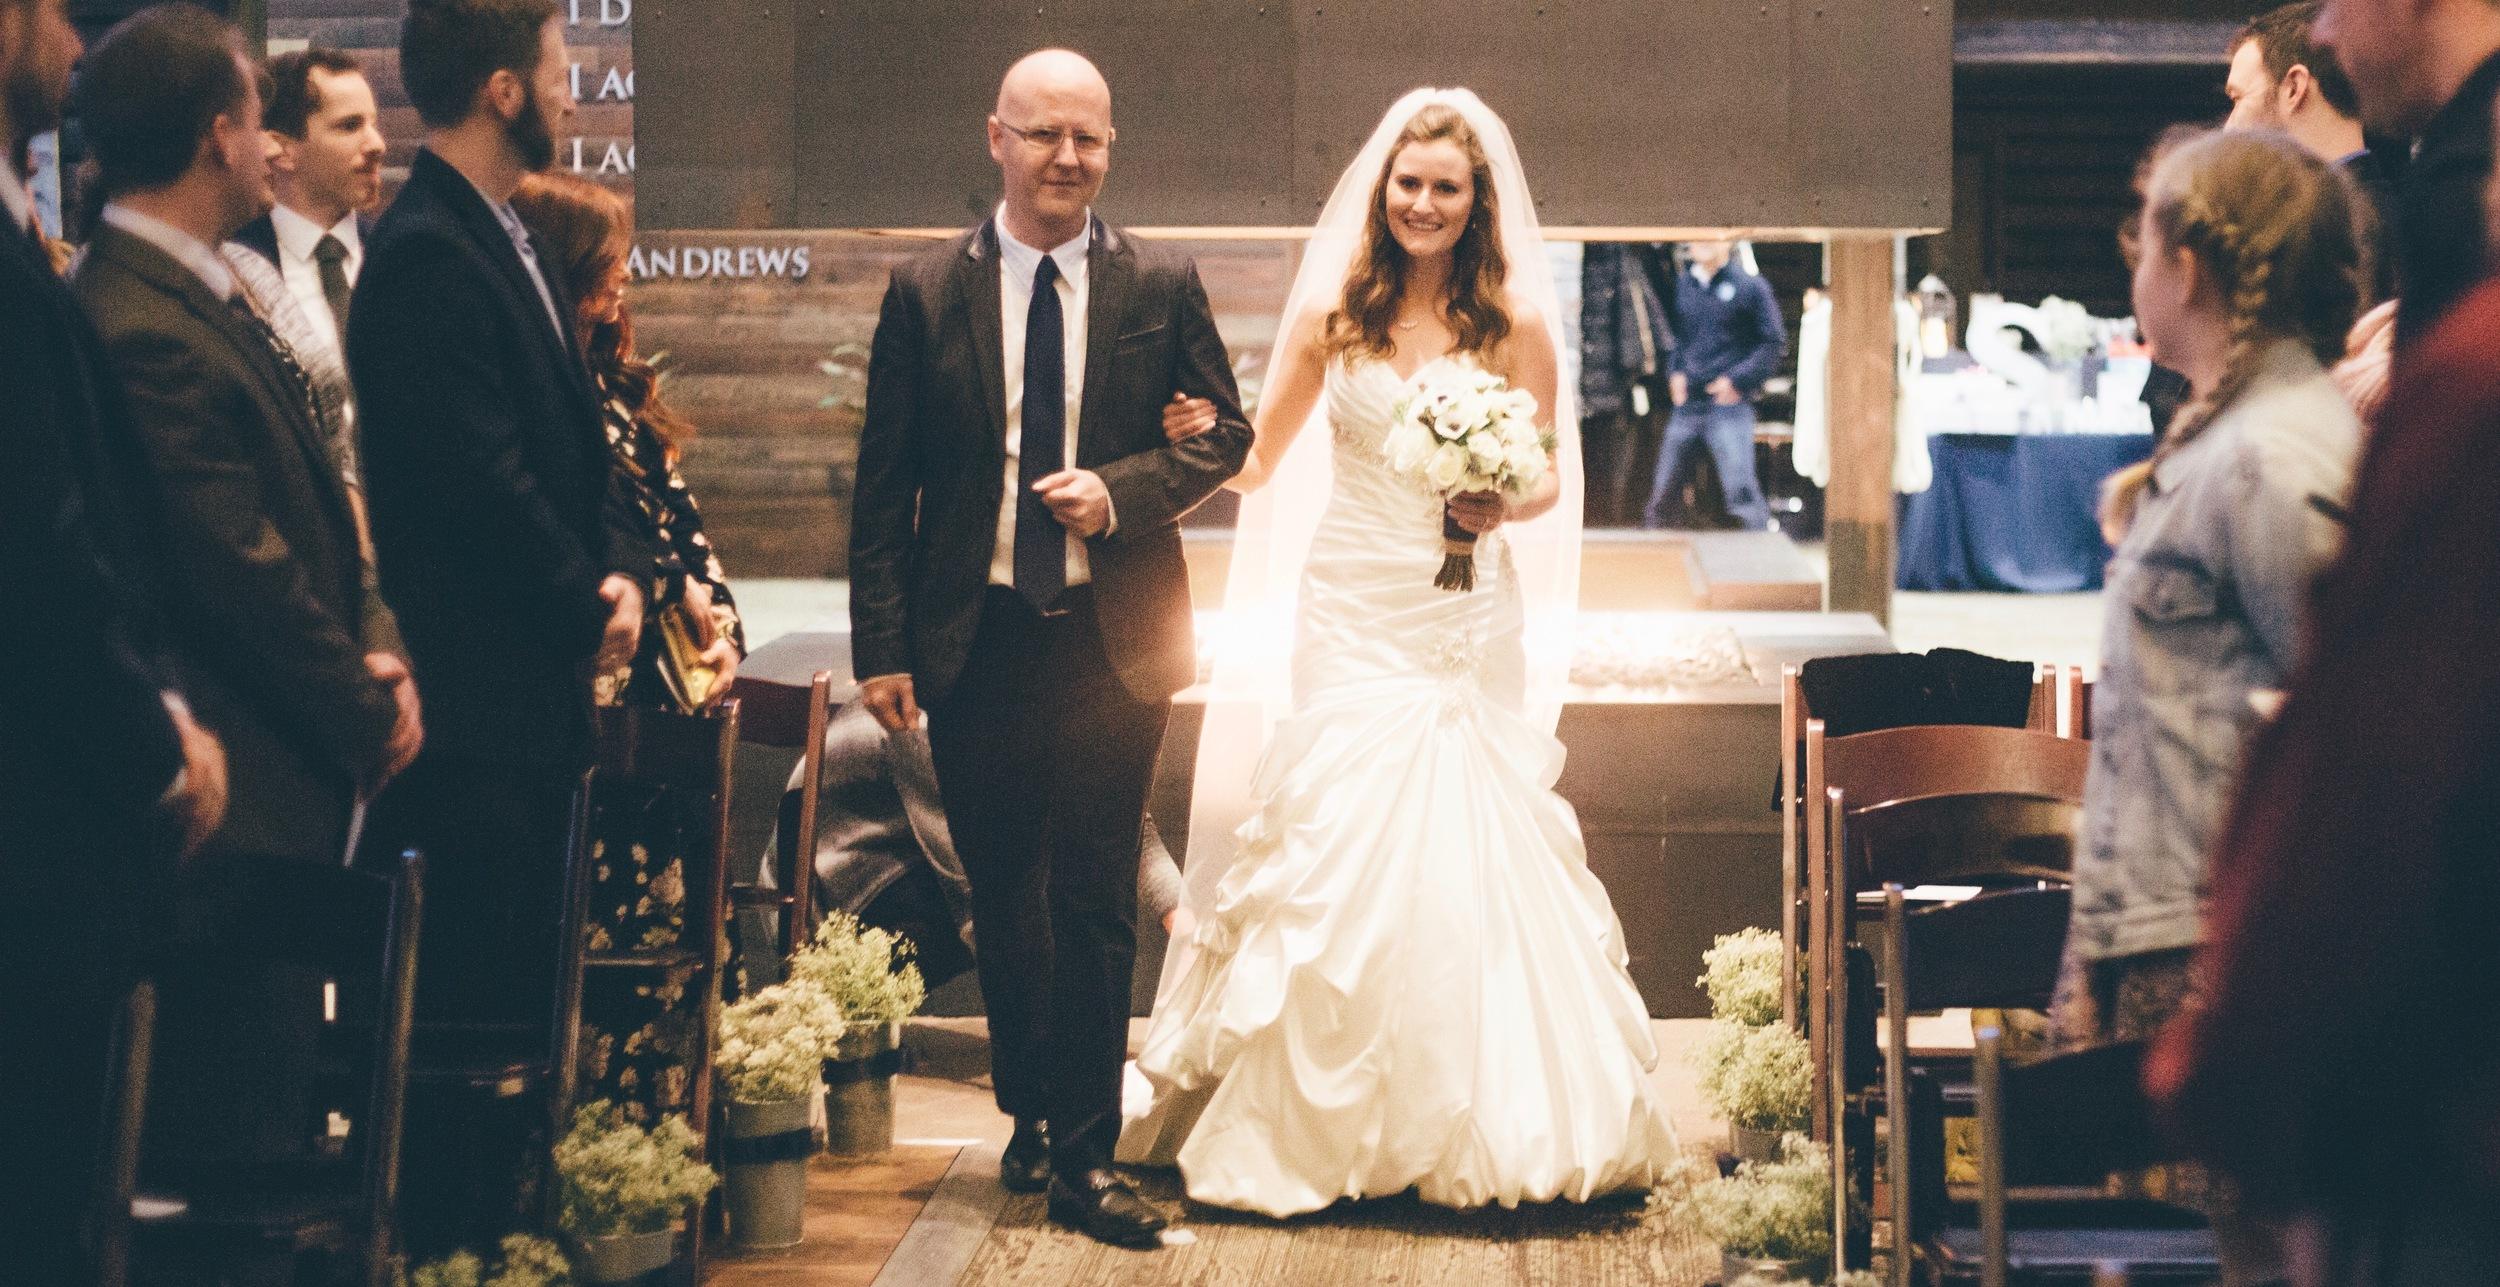 snodgrass_wedding-372.jpg